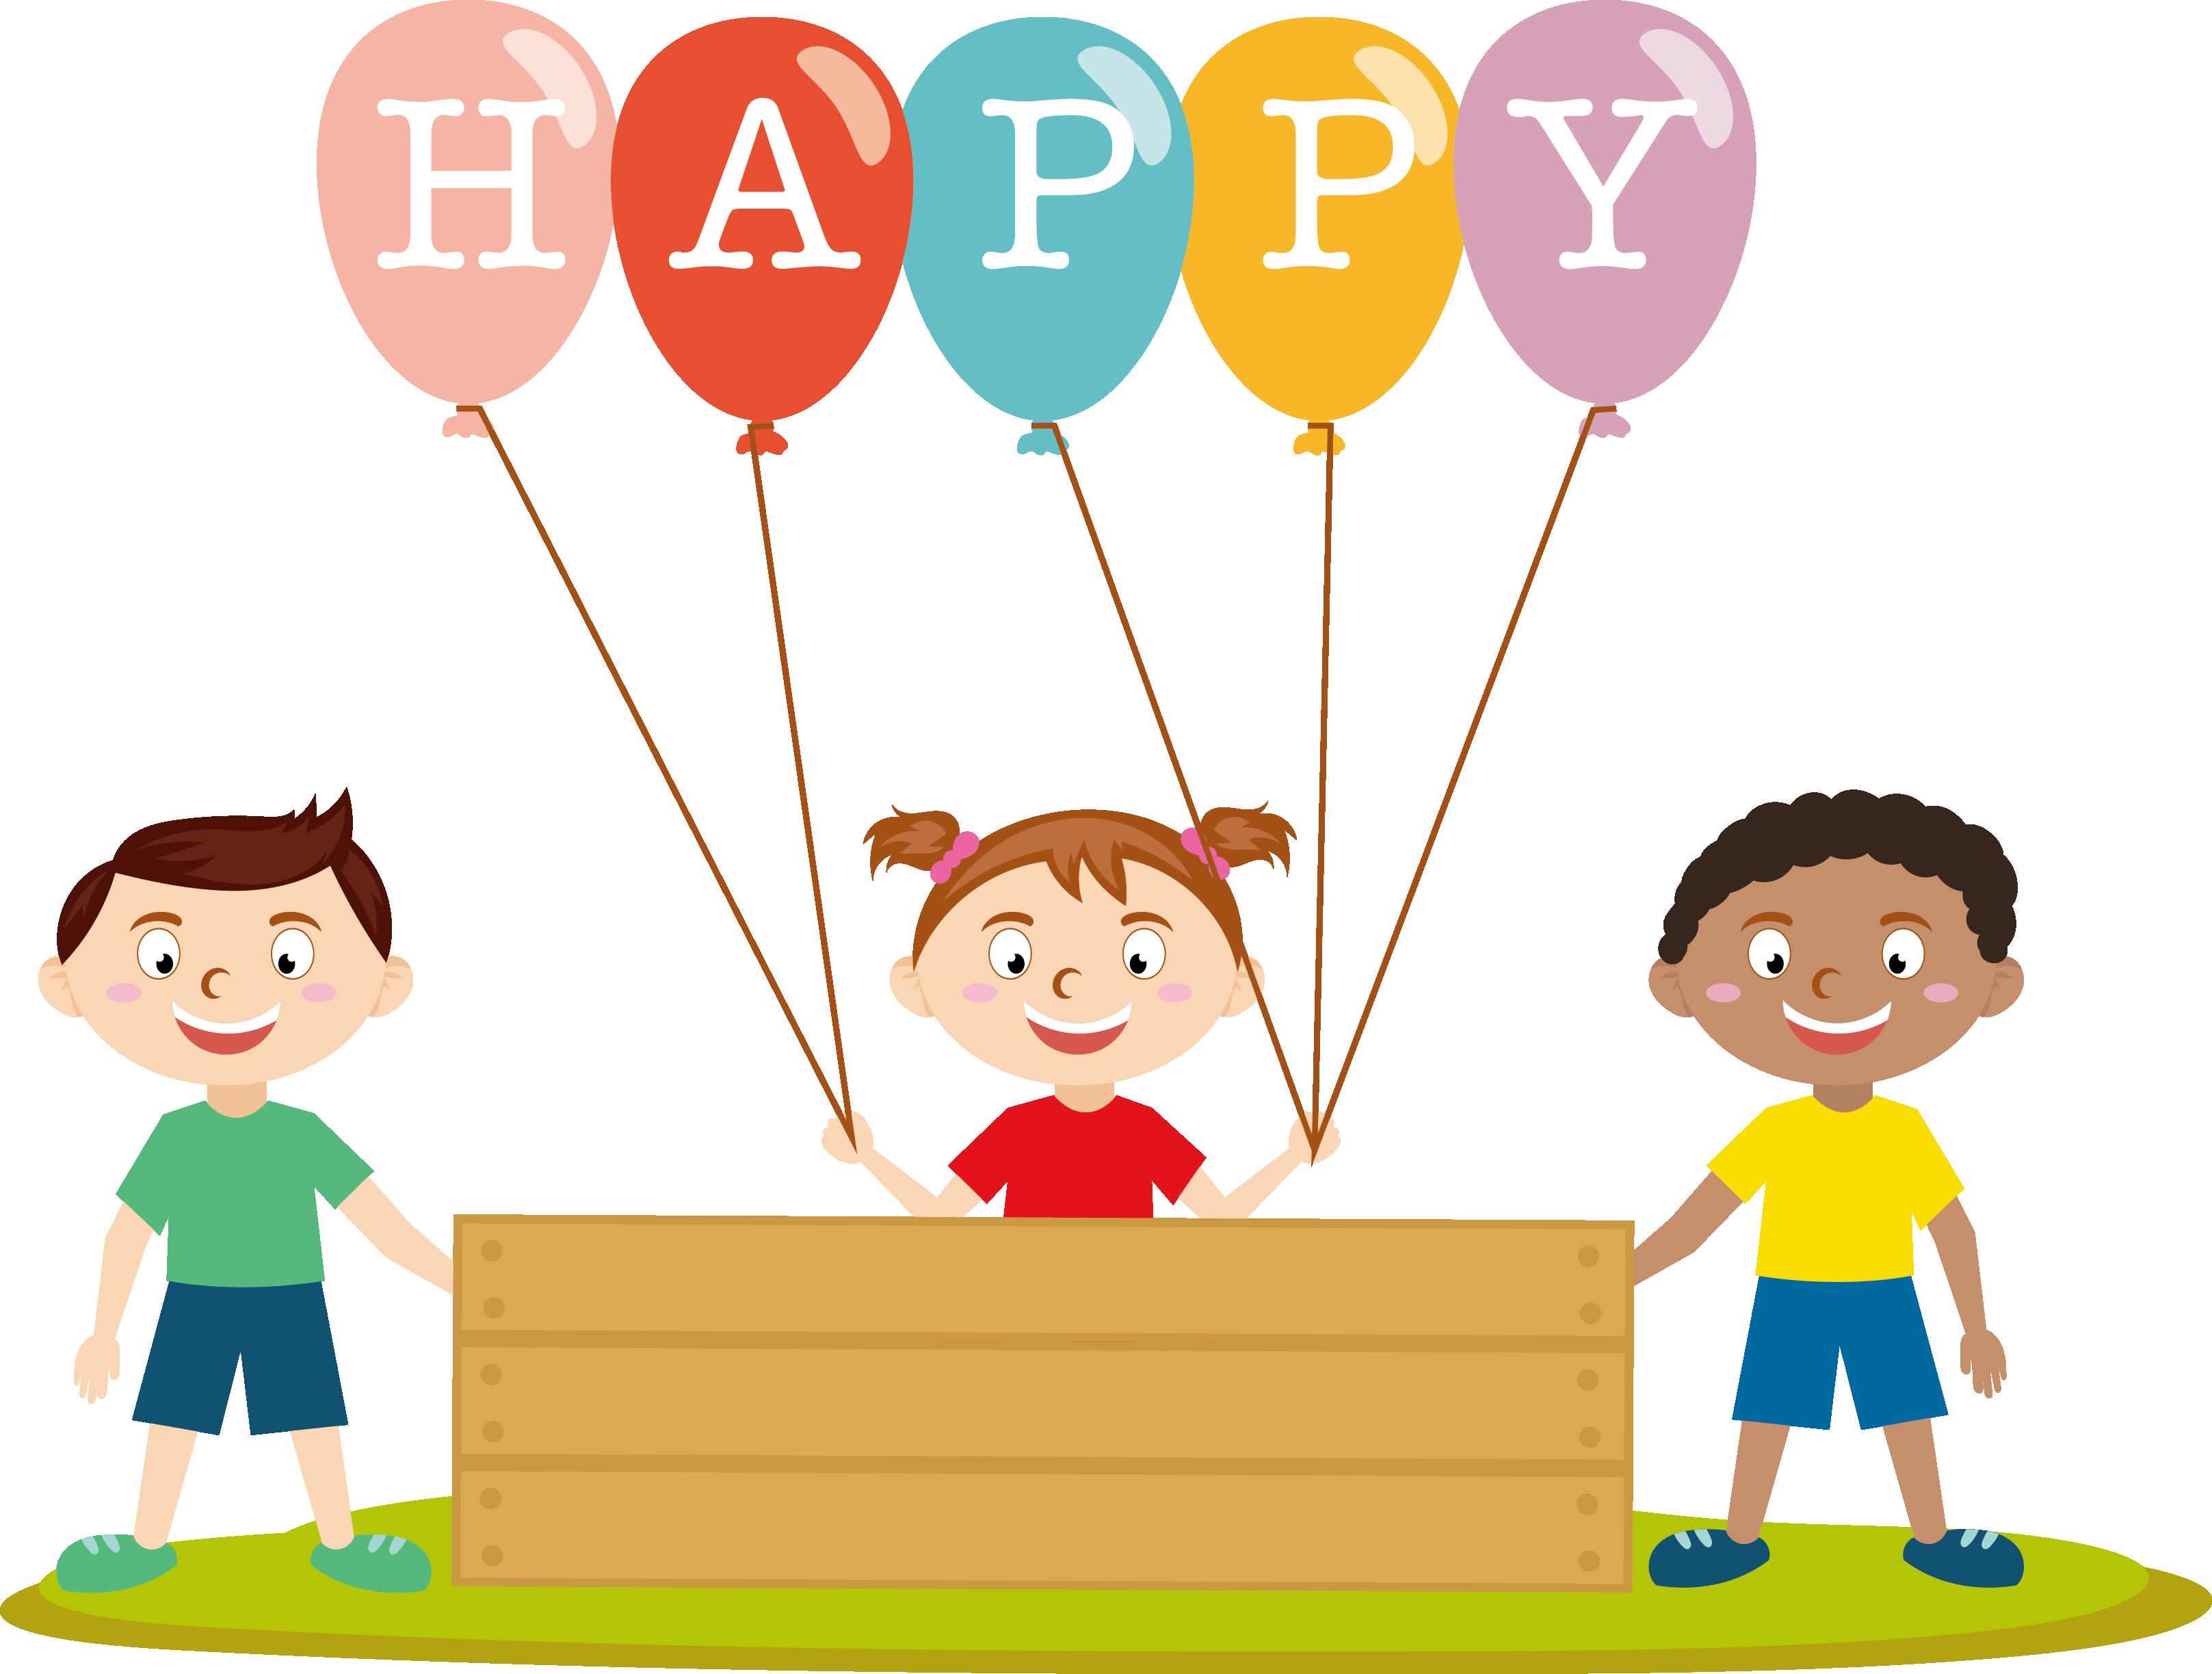 Childrens day clip art. Clipart balloon stall